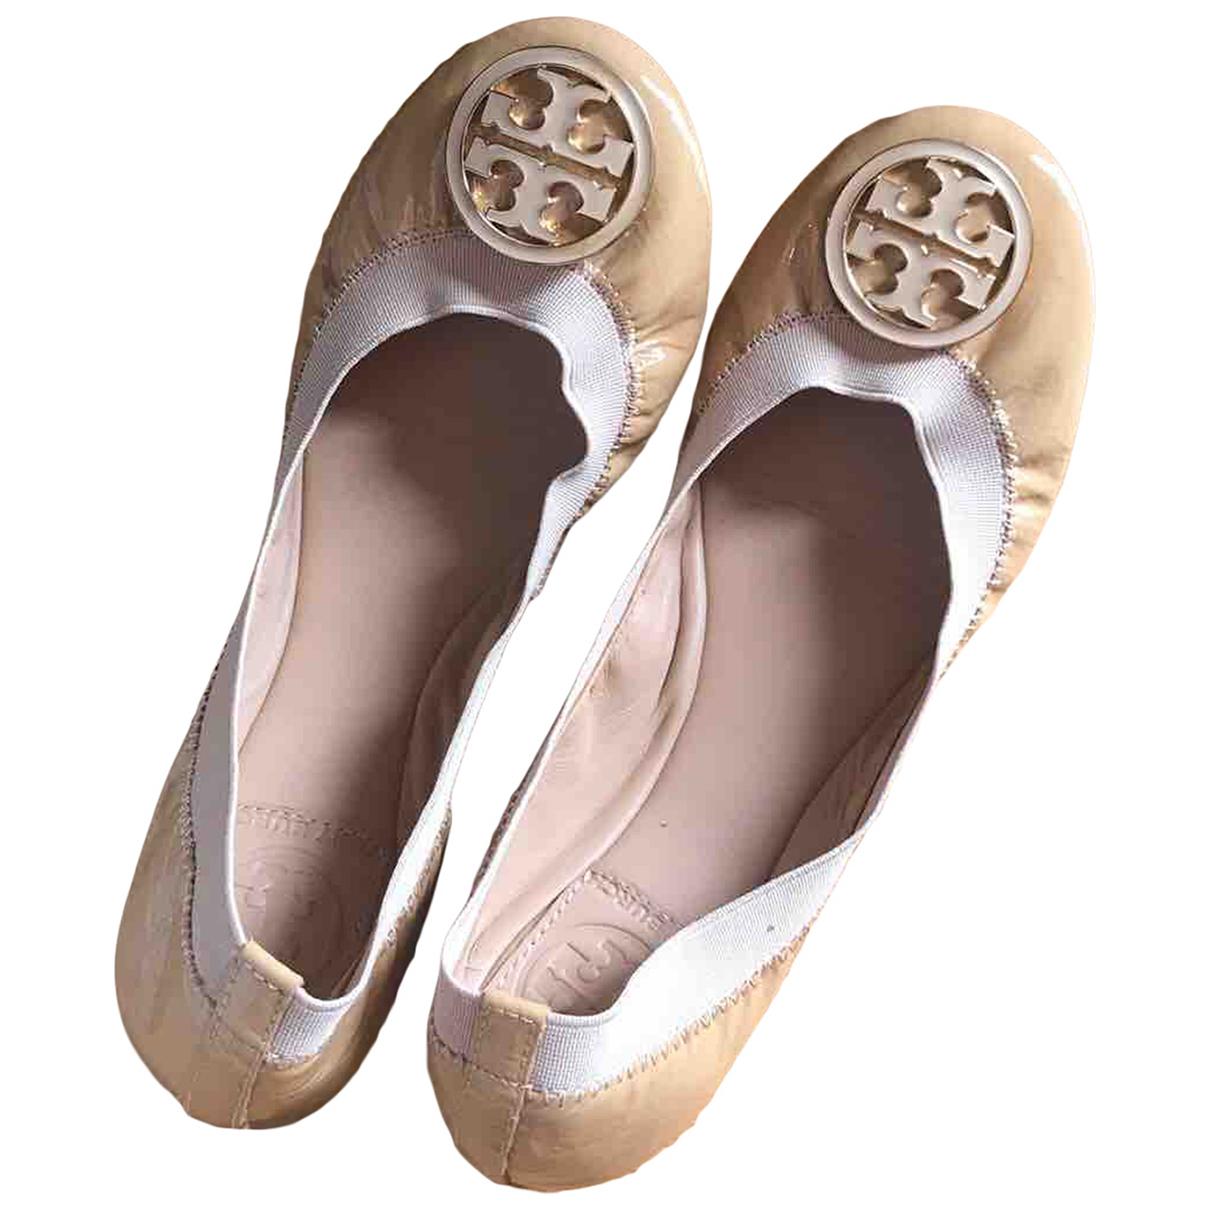 Bailarinas de Charol Tory Burch